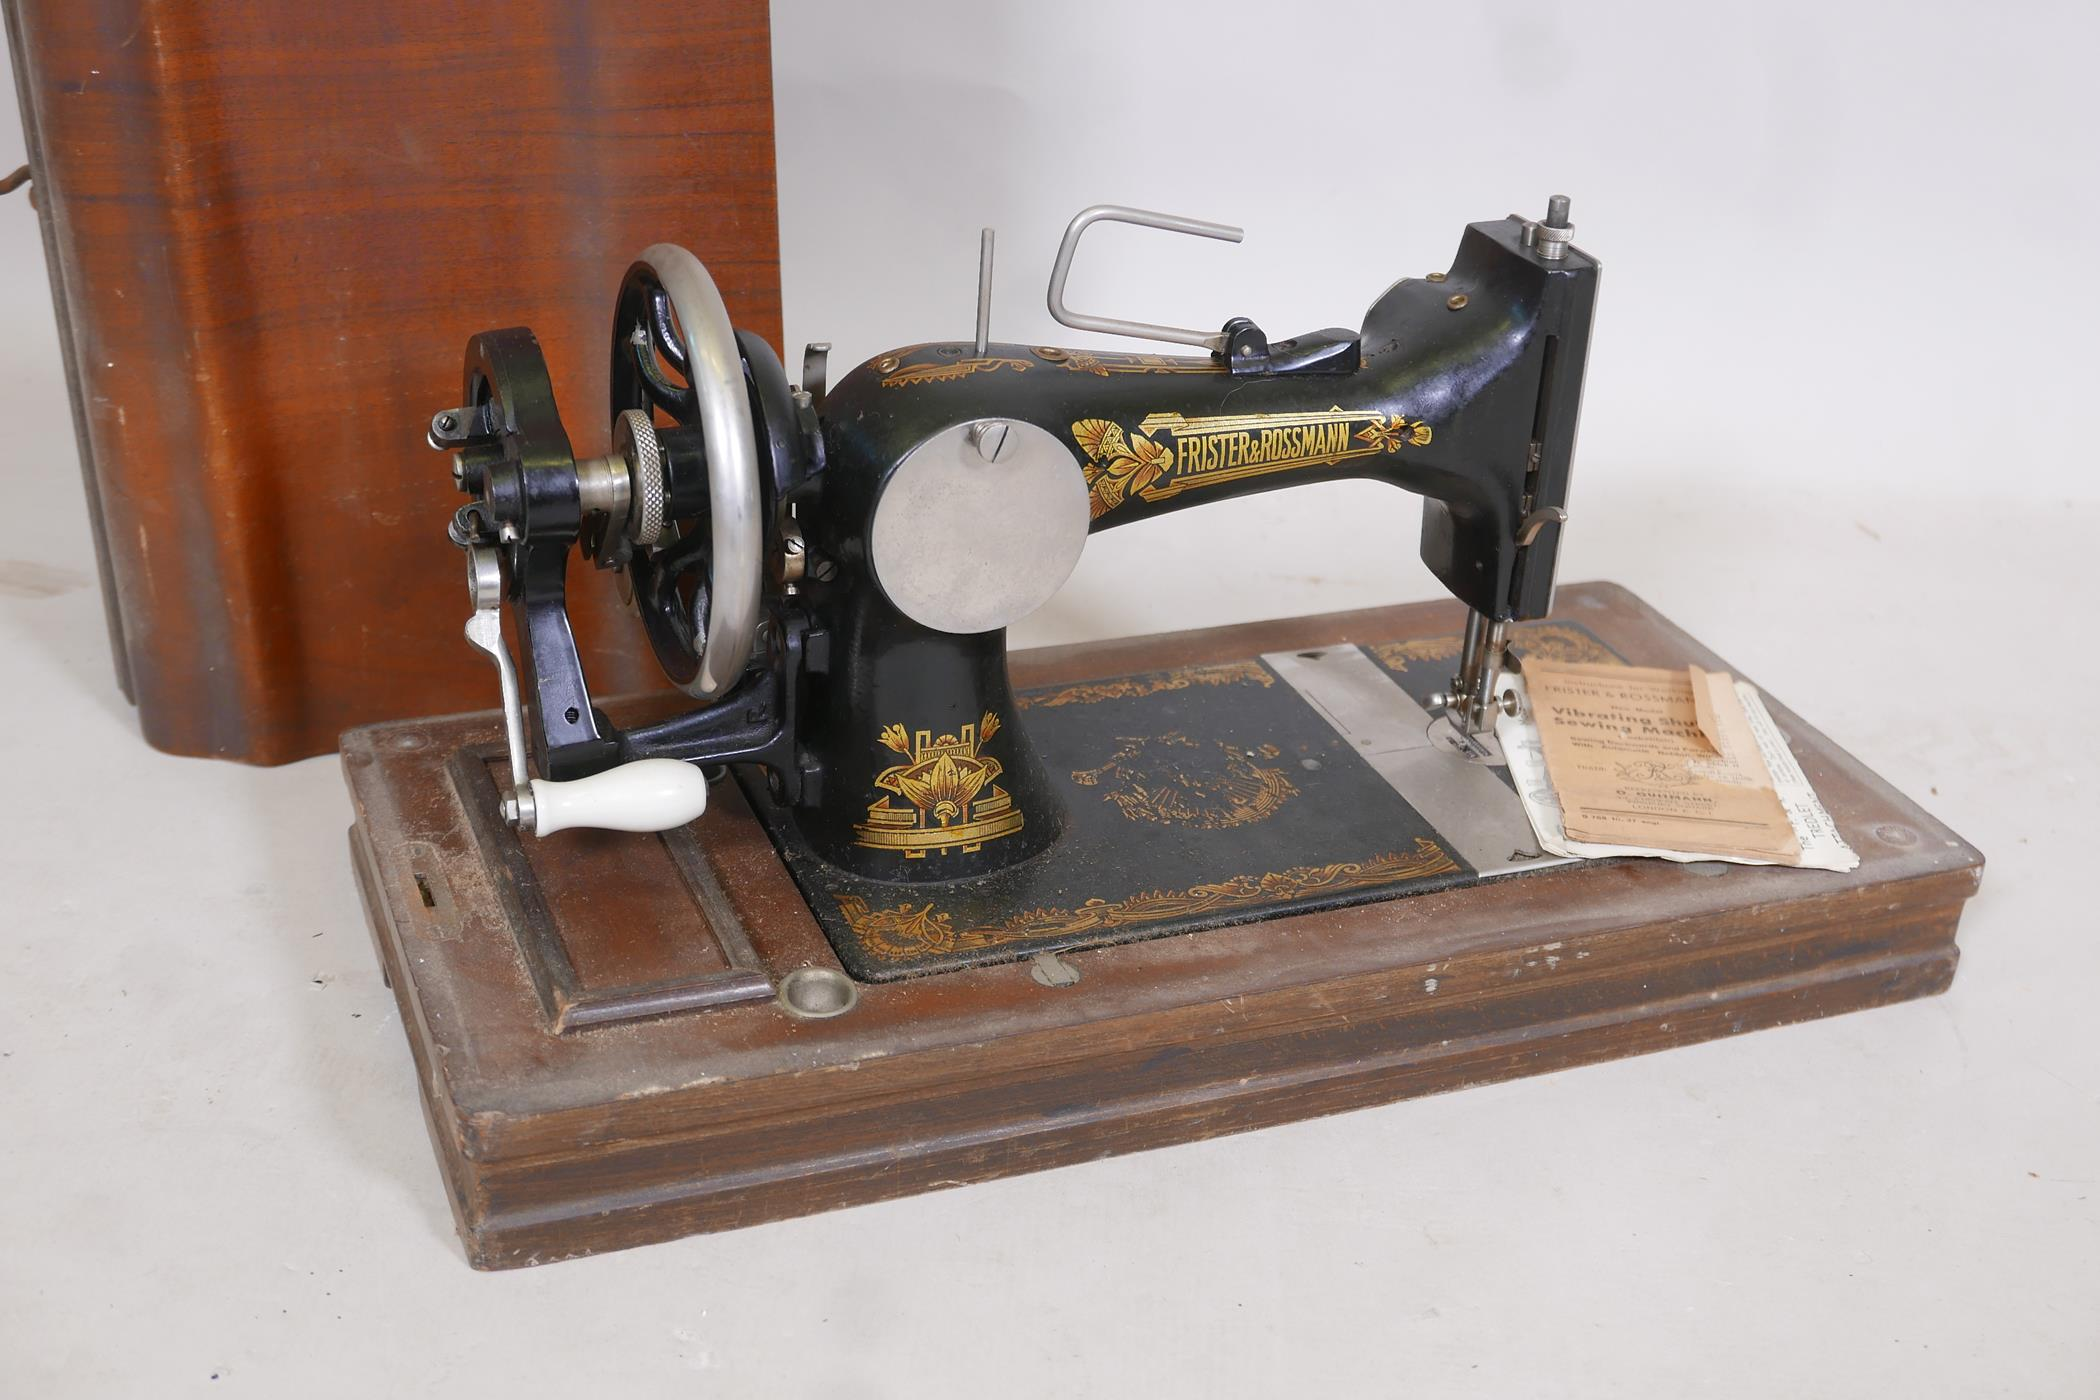 "A Frister & Rossman antique sewing machine in case, 21"" x 13"" x 10"""